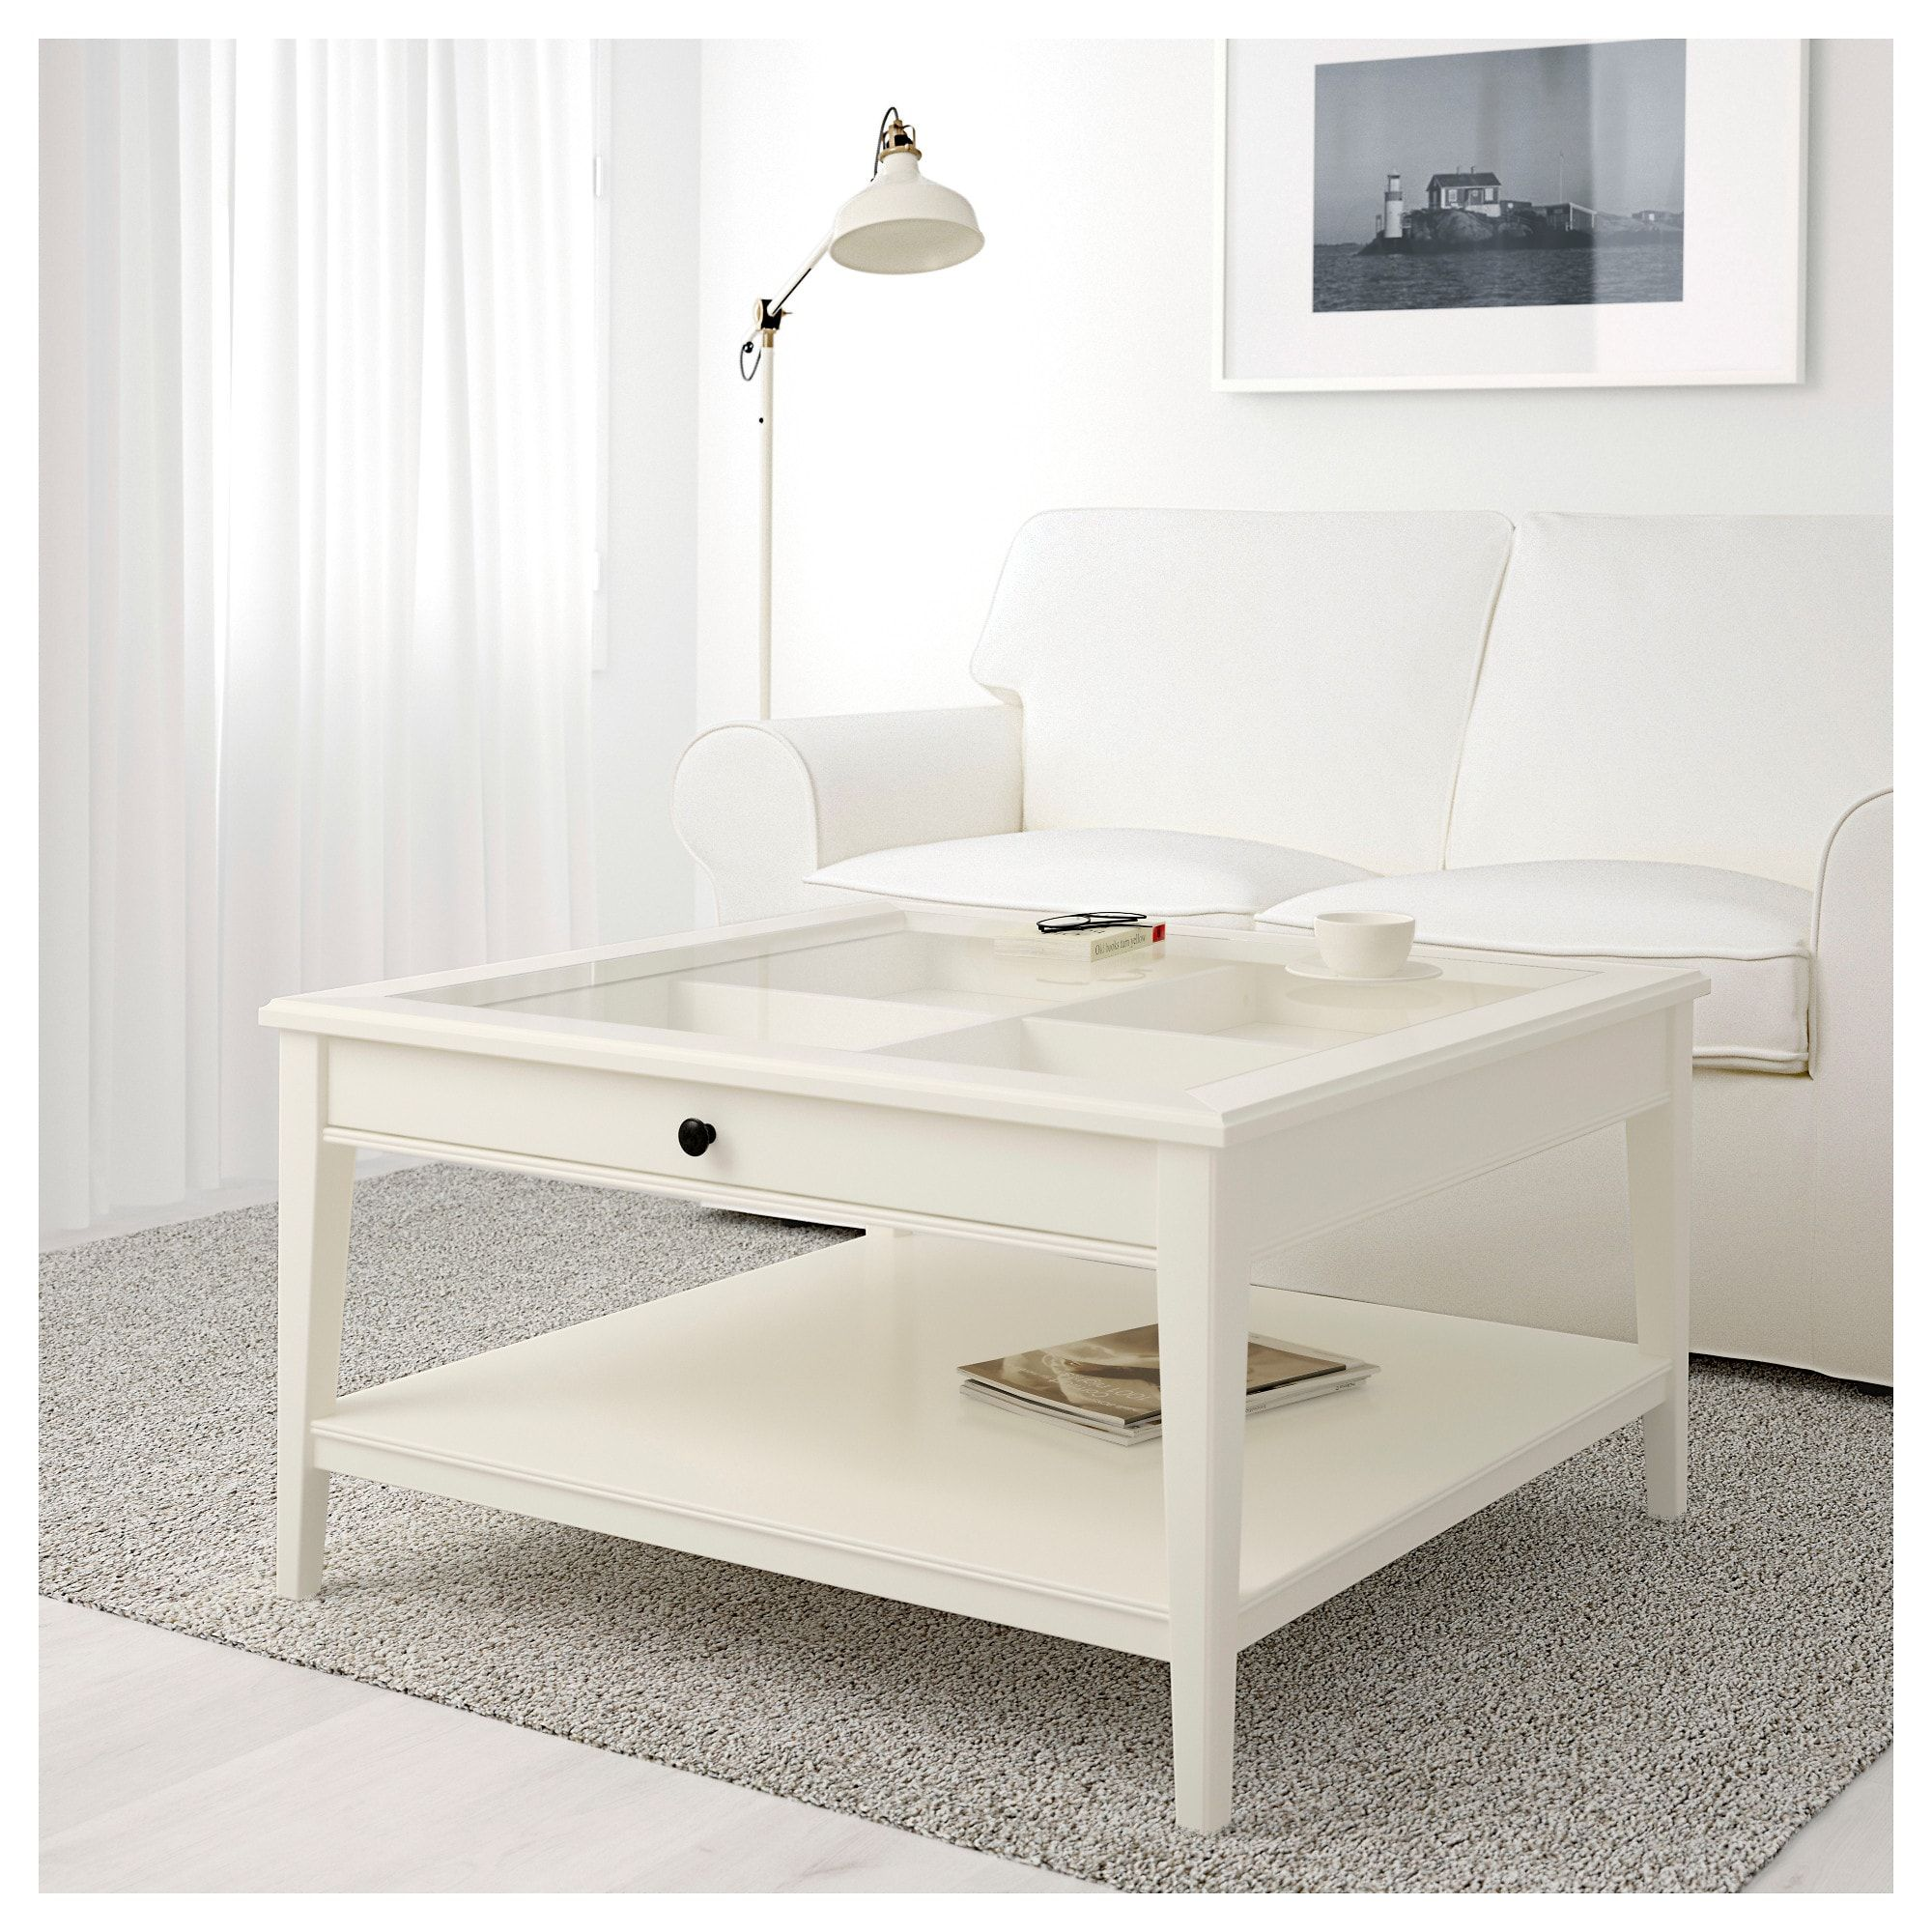 Liatorp Coffee Table White Glass 36 5 8x36 5 8 Ikea Ikea Hemnes Coffee Table Coffee Table White Ikea Coffee Table